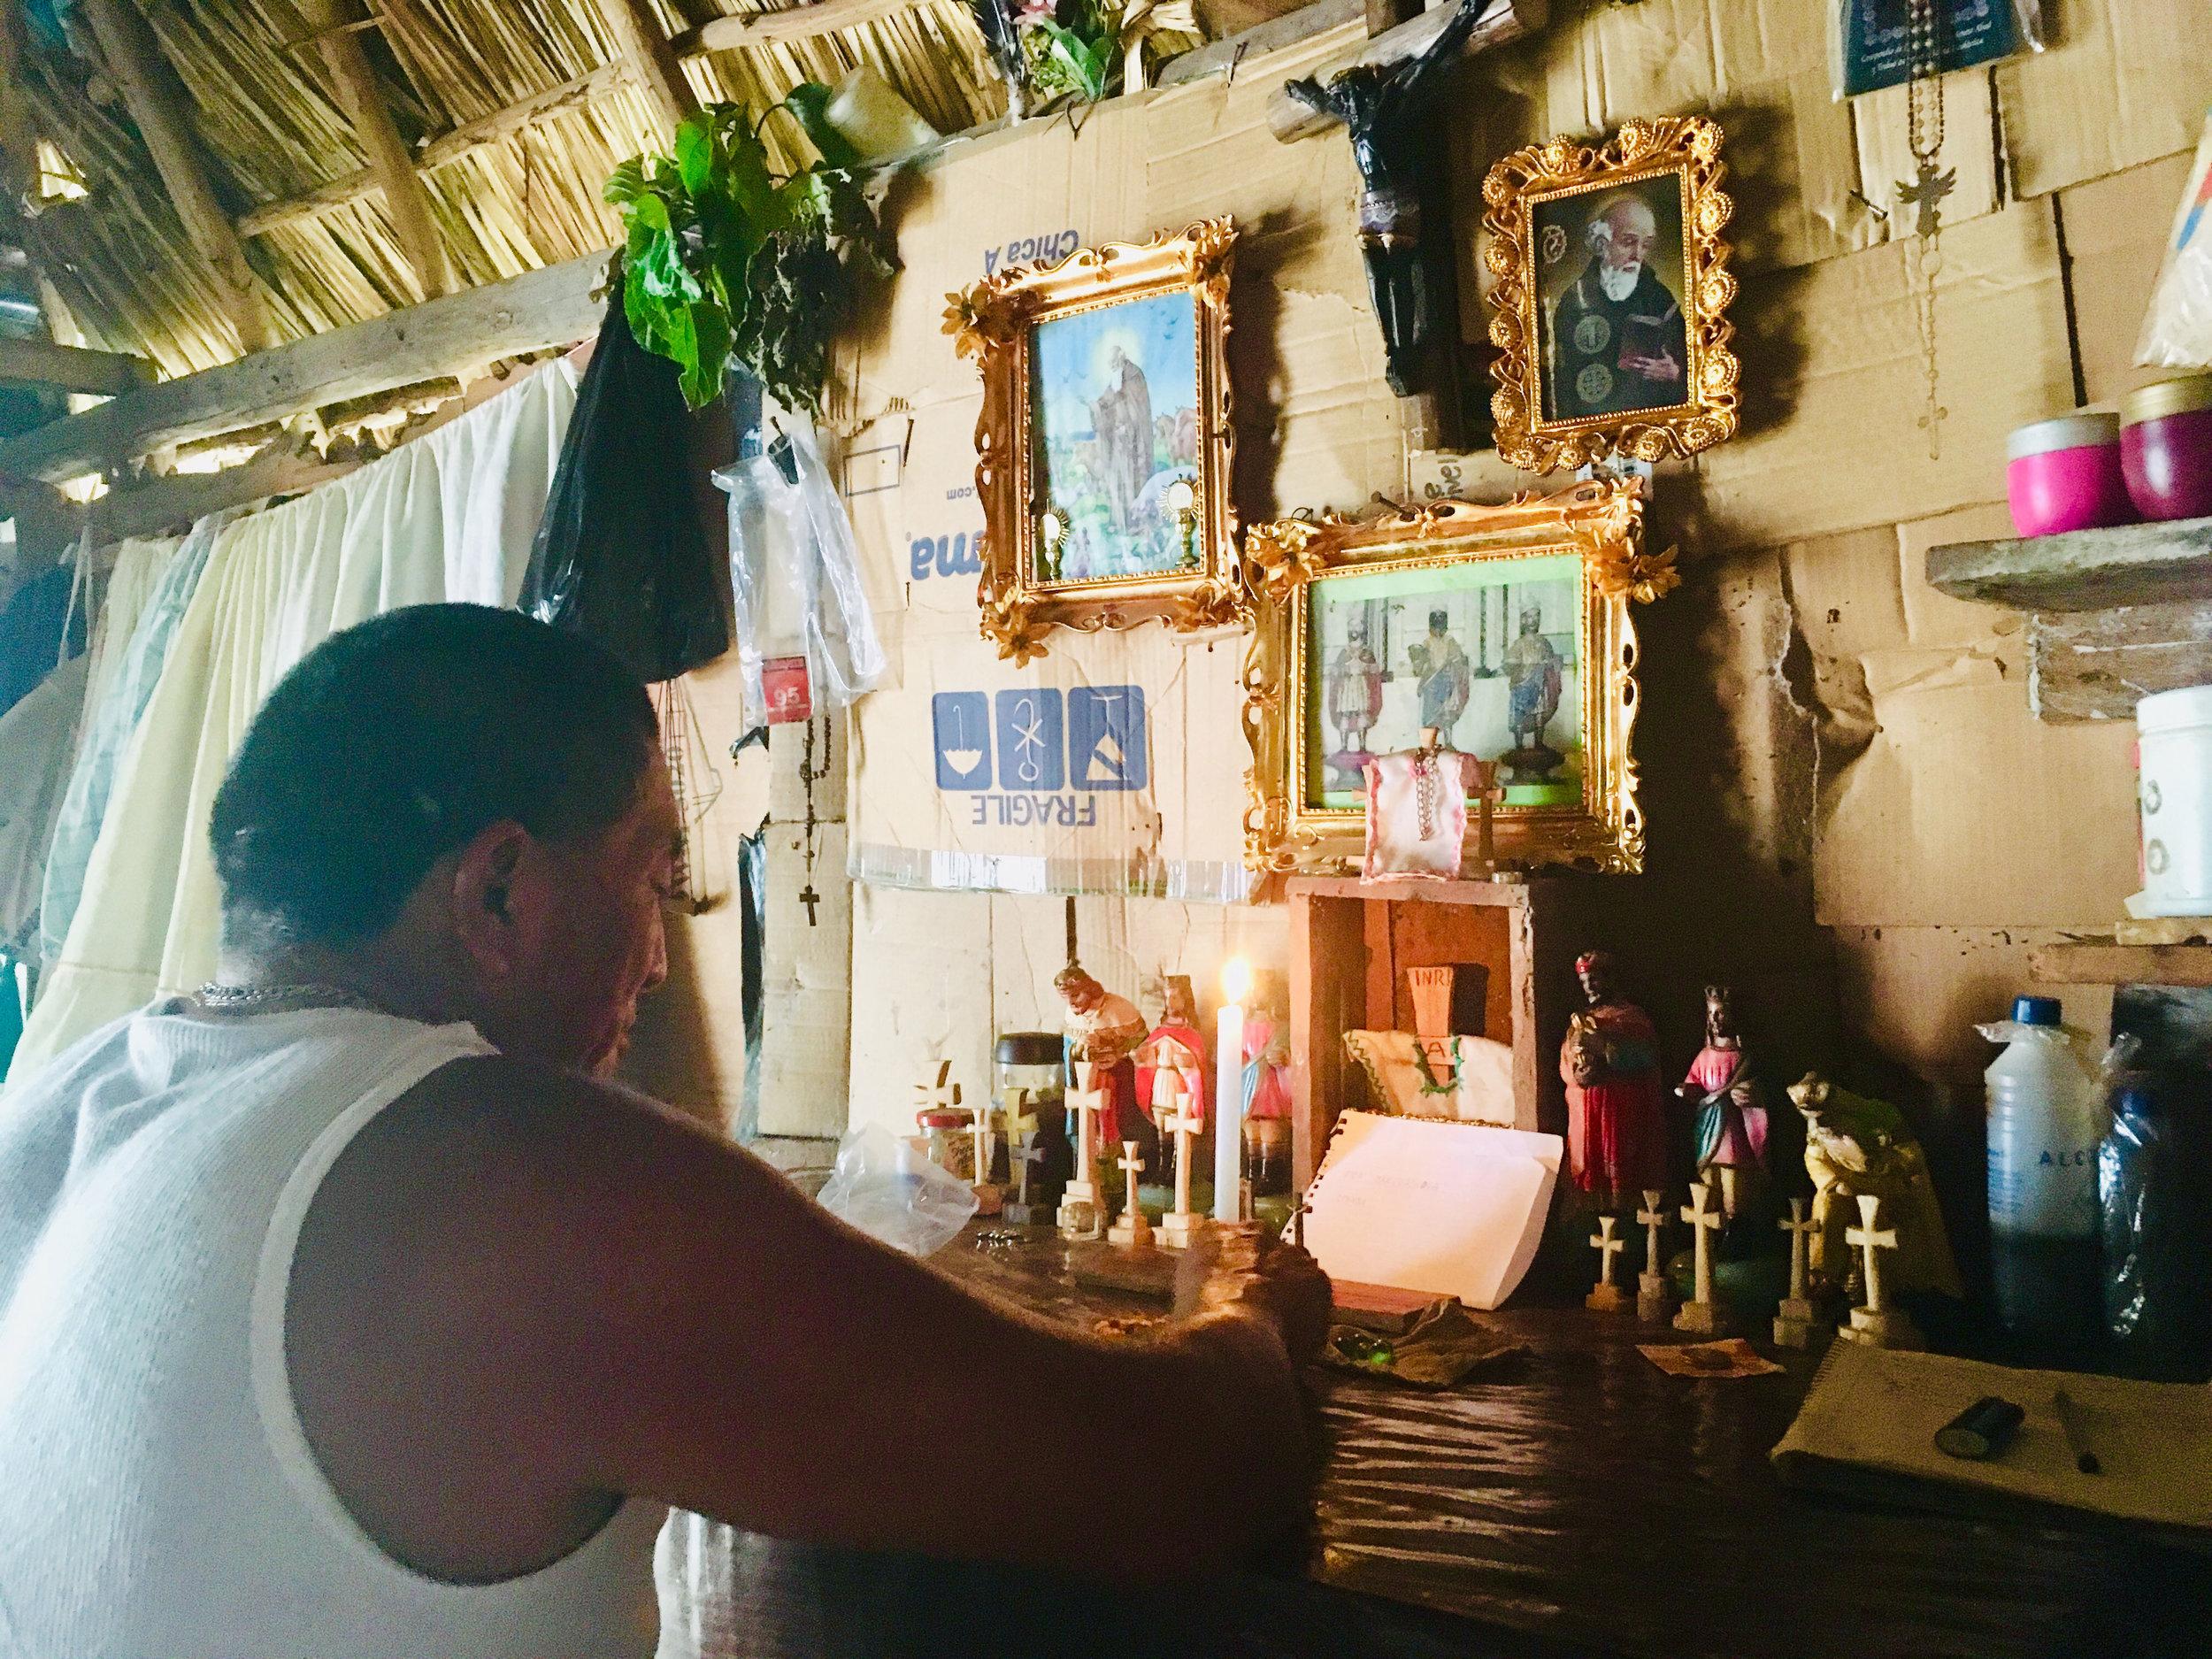 Hammocks_and_Ruins_Blog_People_of_Mexico_.15.jpg